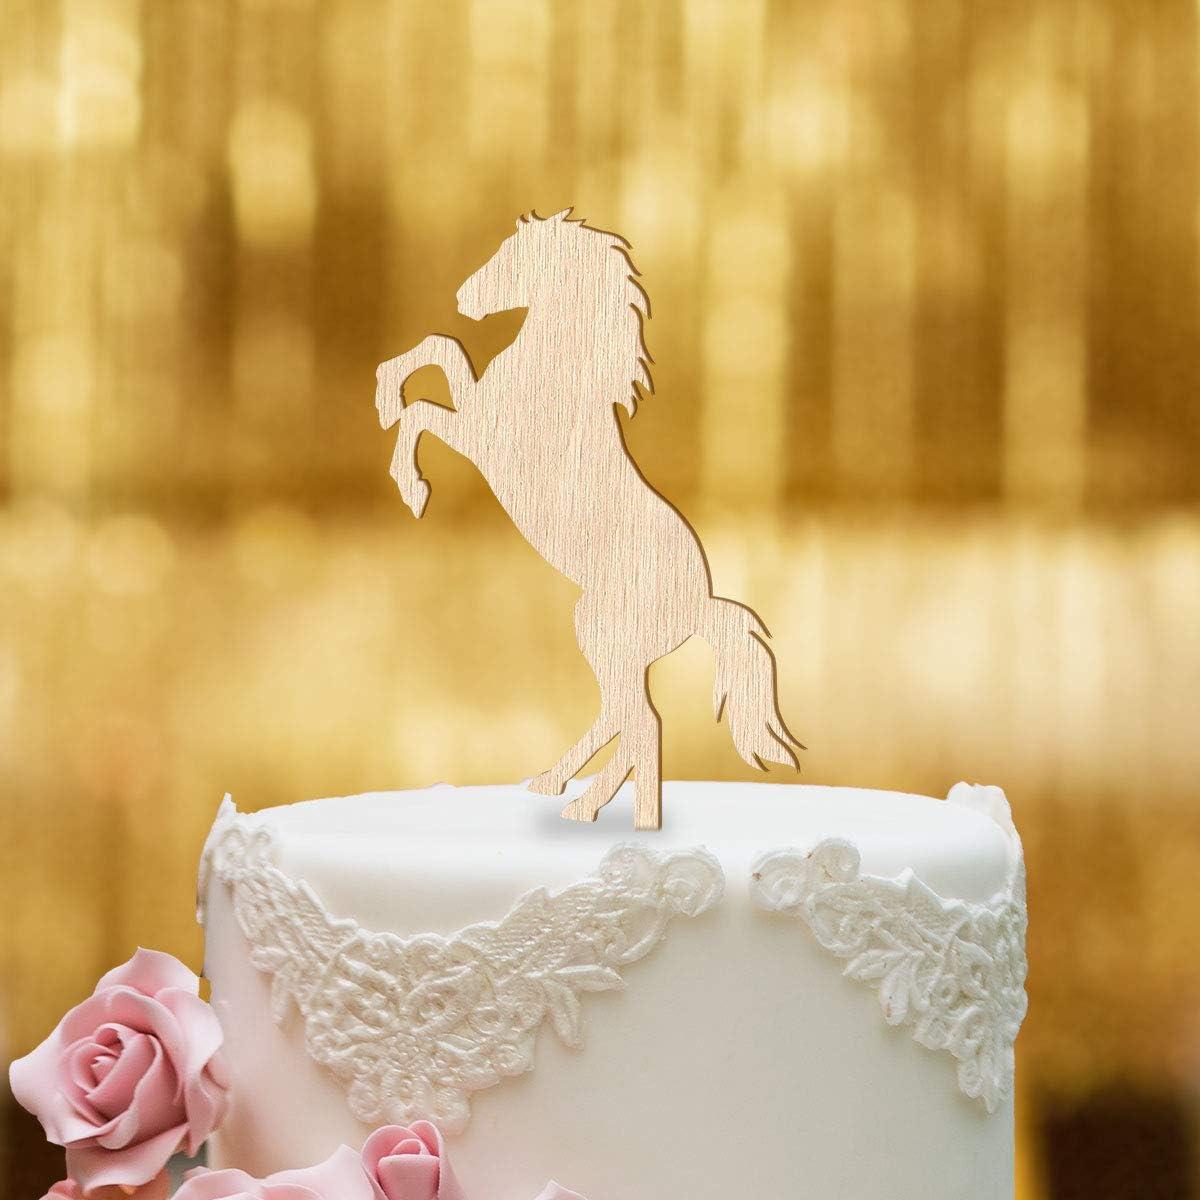 Dankeskarte.com Decoración para tartas, diseño de caballo – Madera – Decoración para tartas, decoración para tartas, decoración de cumpleaños, pony